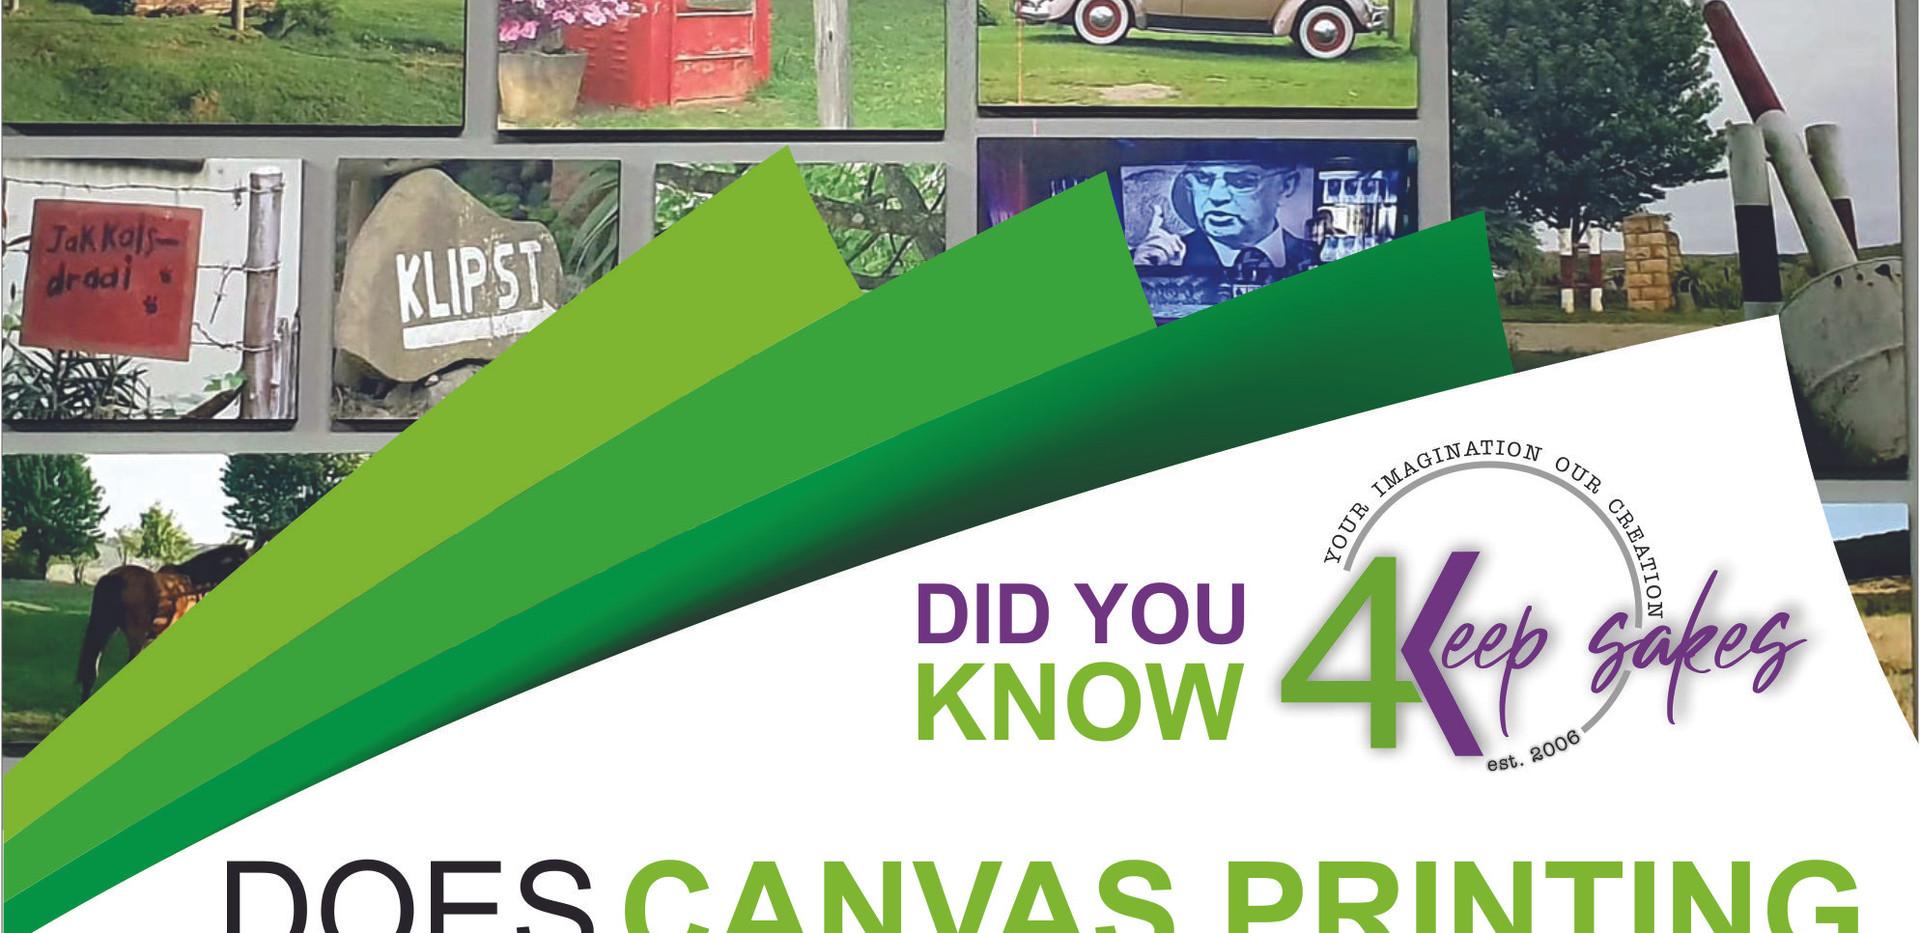 Did you know 4keepsake Canvas.jpg